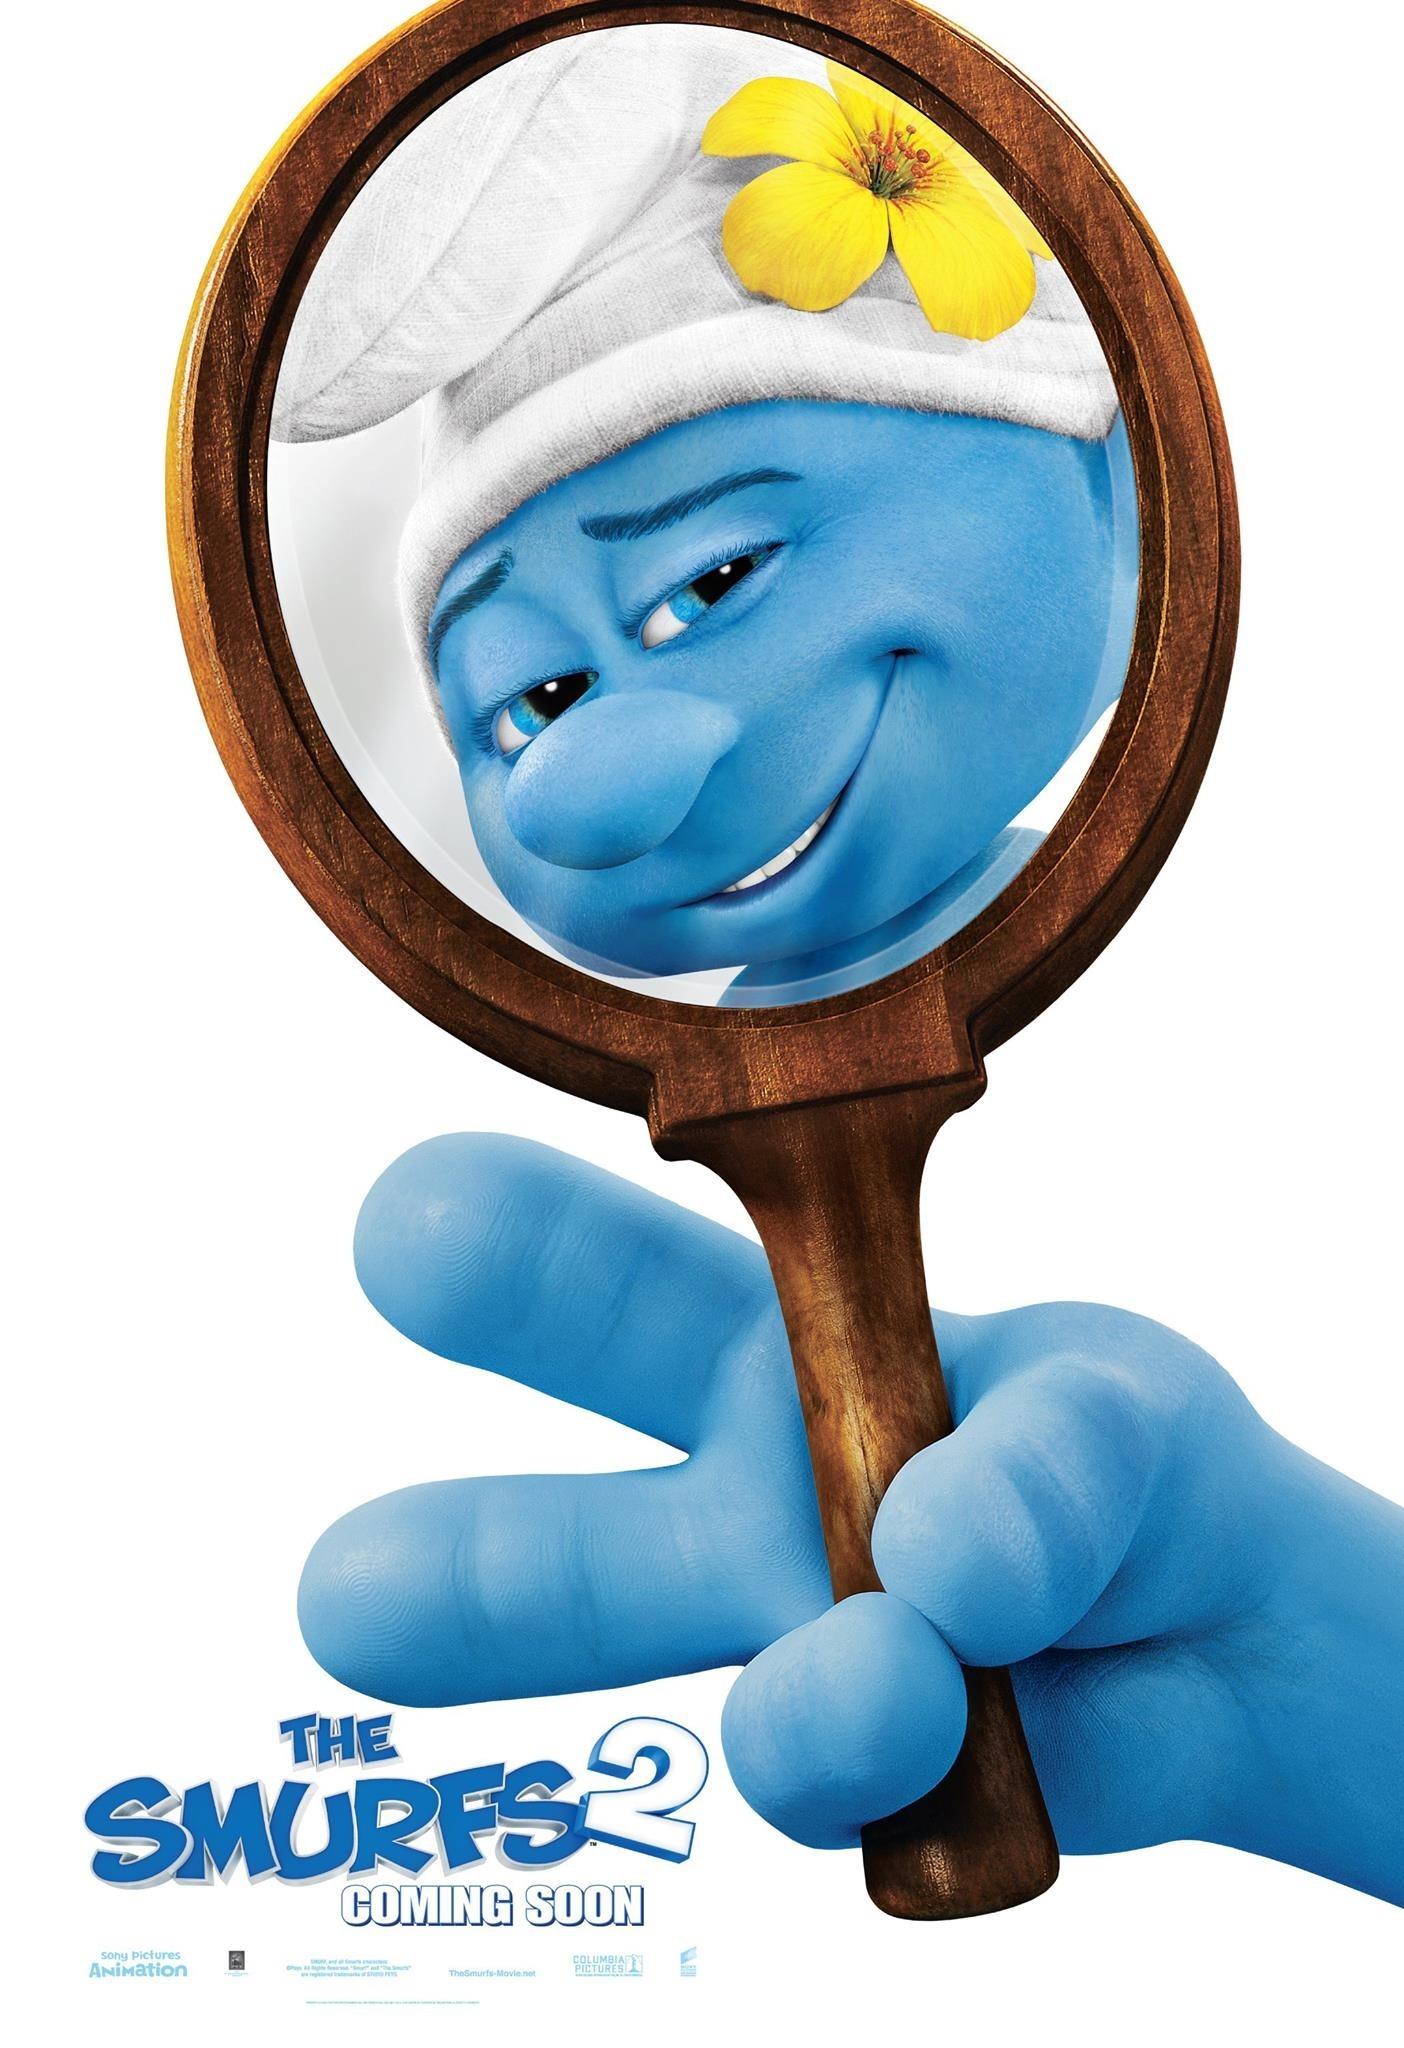 http://collider.com/wp-content/uploads/the-smurfs-2-poster1.jpg